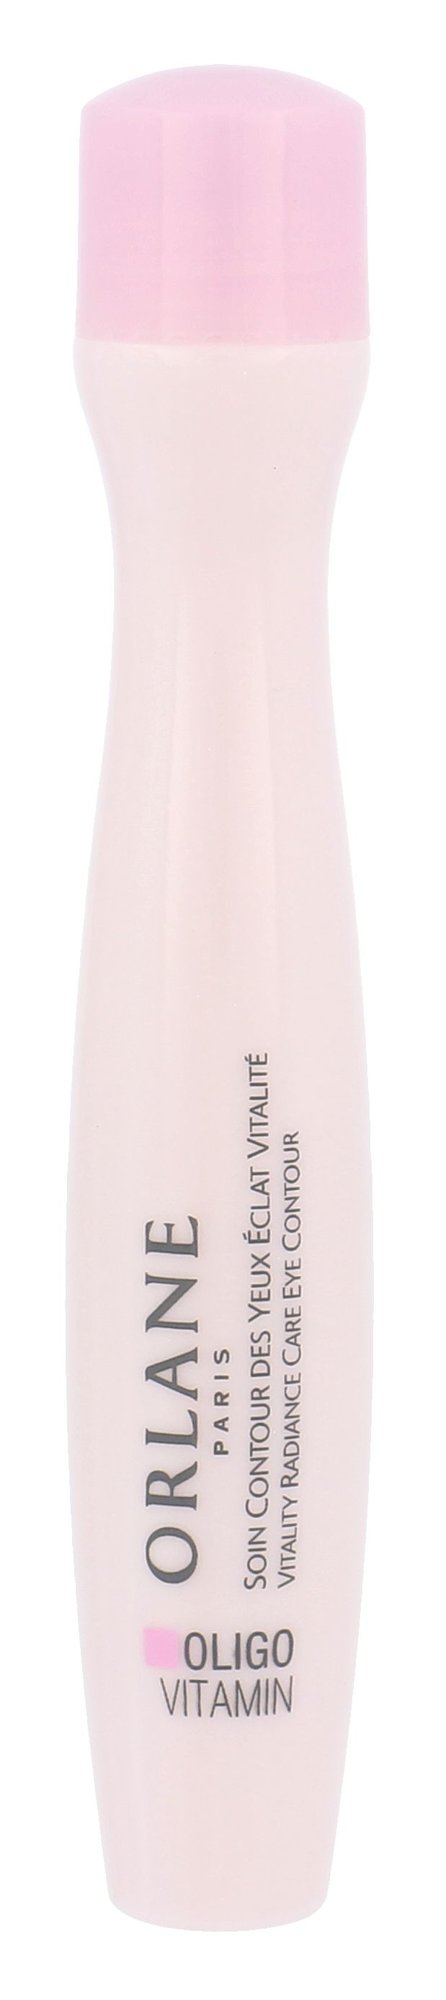 Orlane Oligo Vitamin Cosmetic 15ml